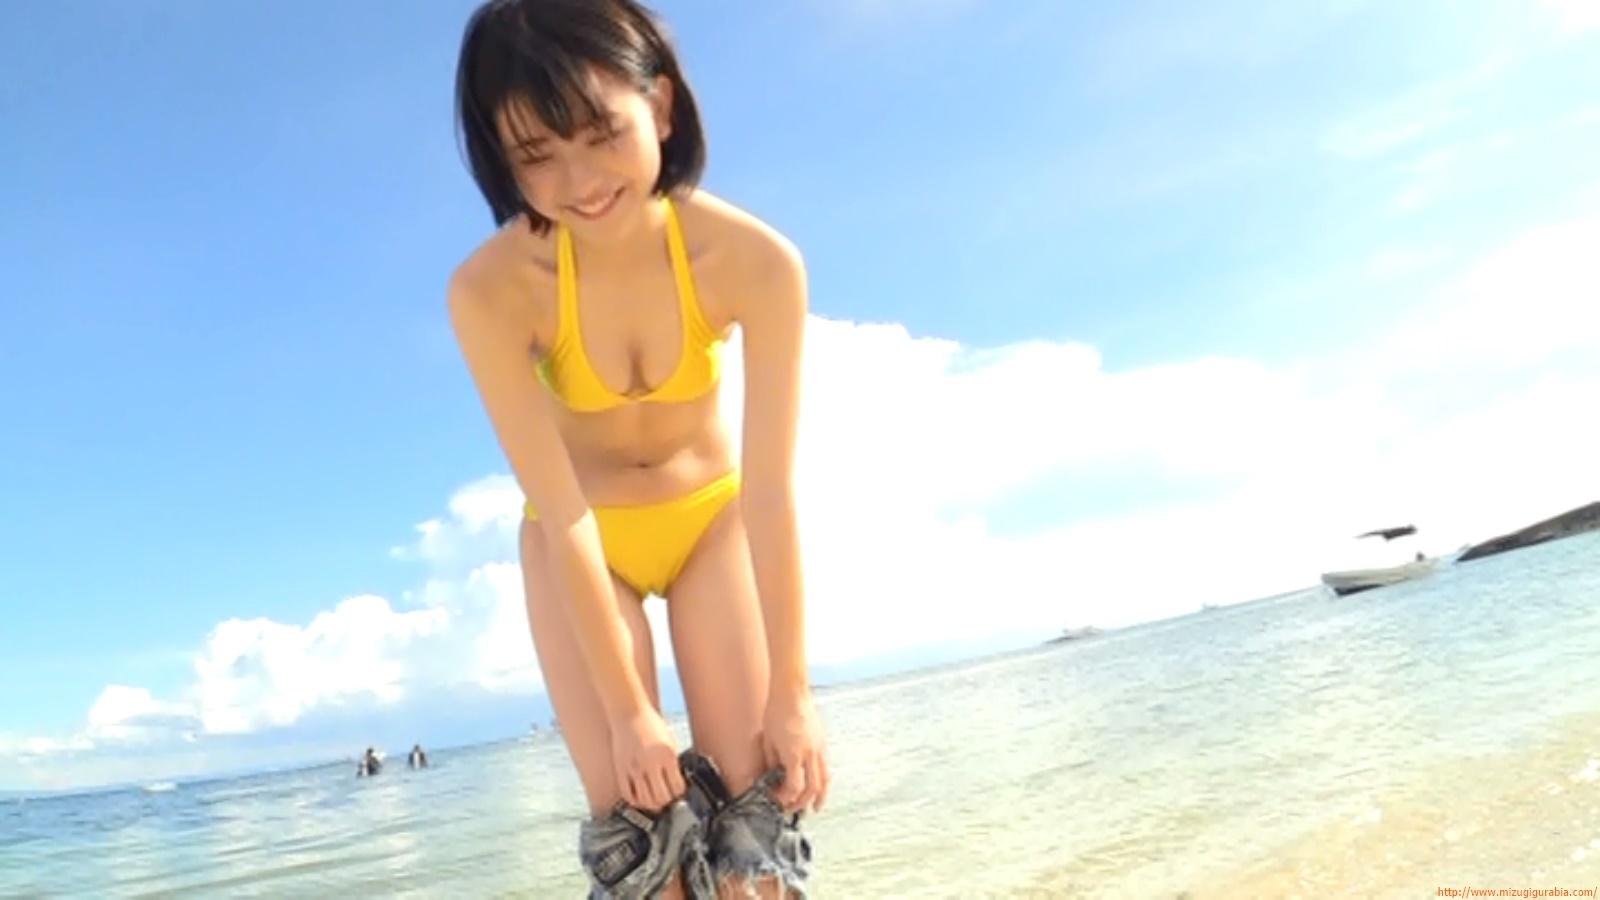 Beach dating126